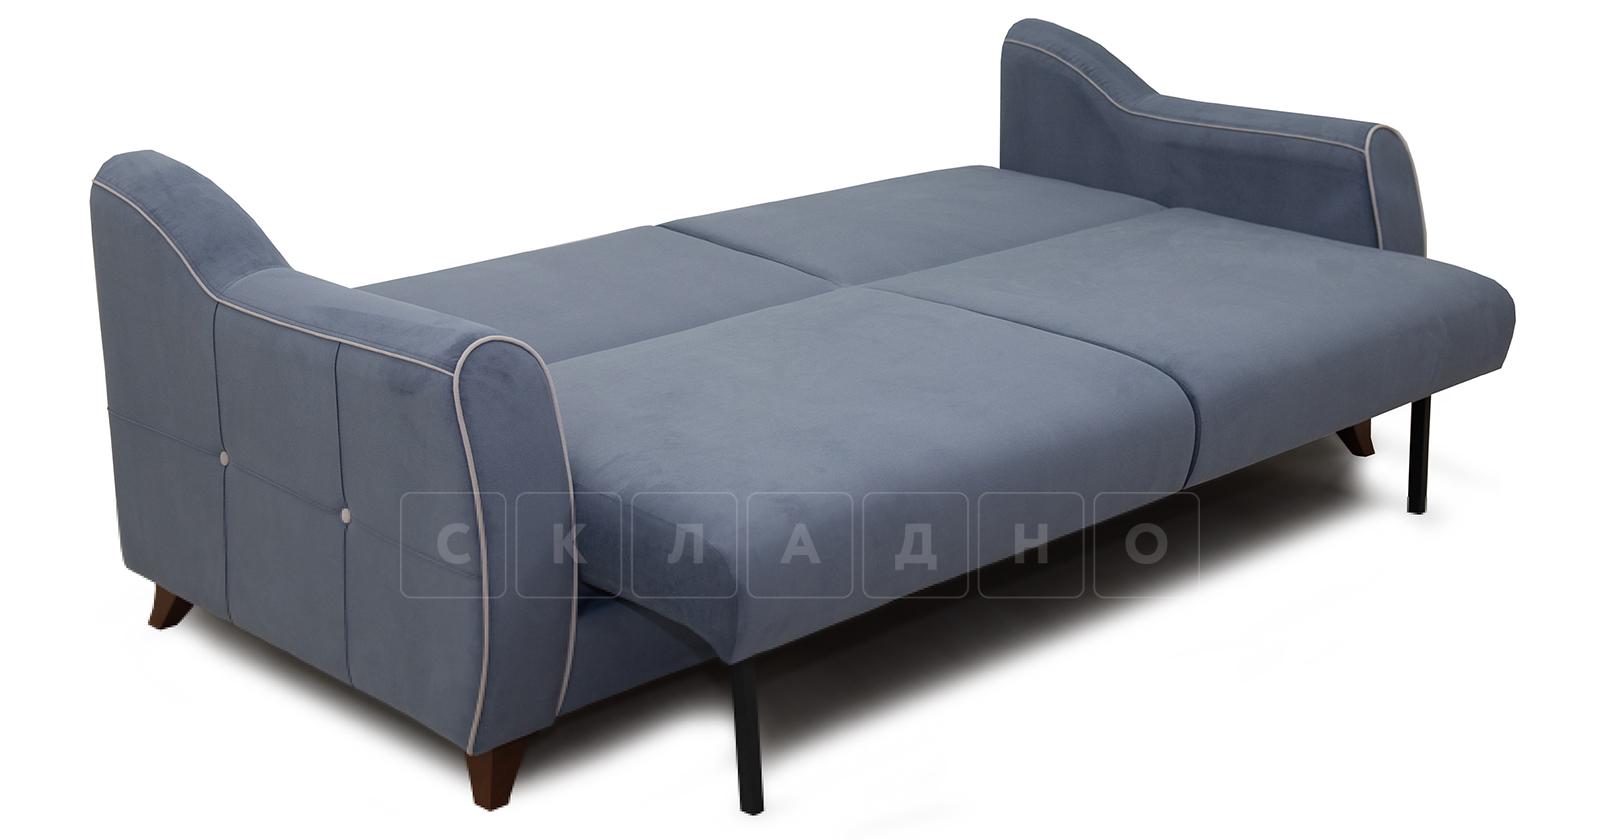 Диван-кровать Флэтфорд серо-синий фото 5 | интернет-магазин Складно